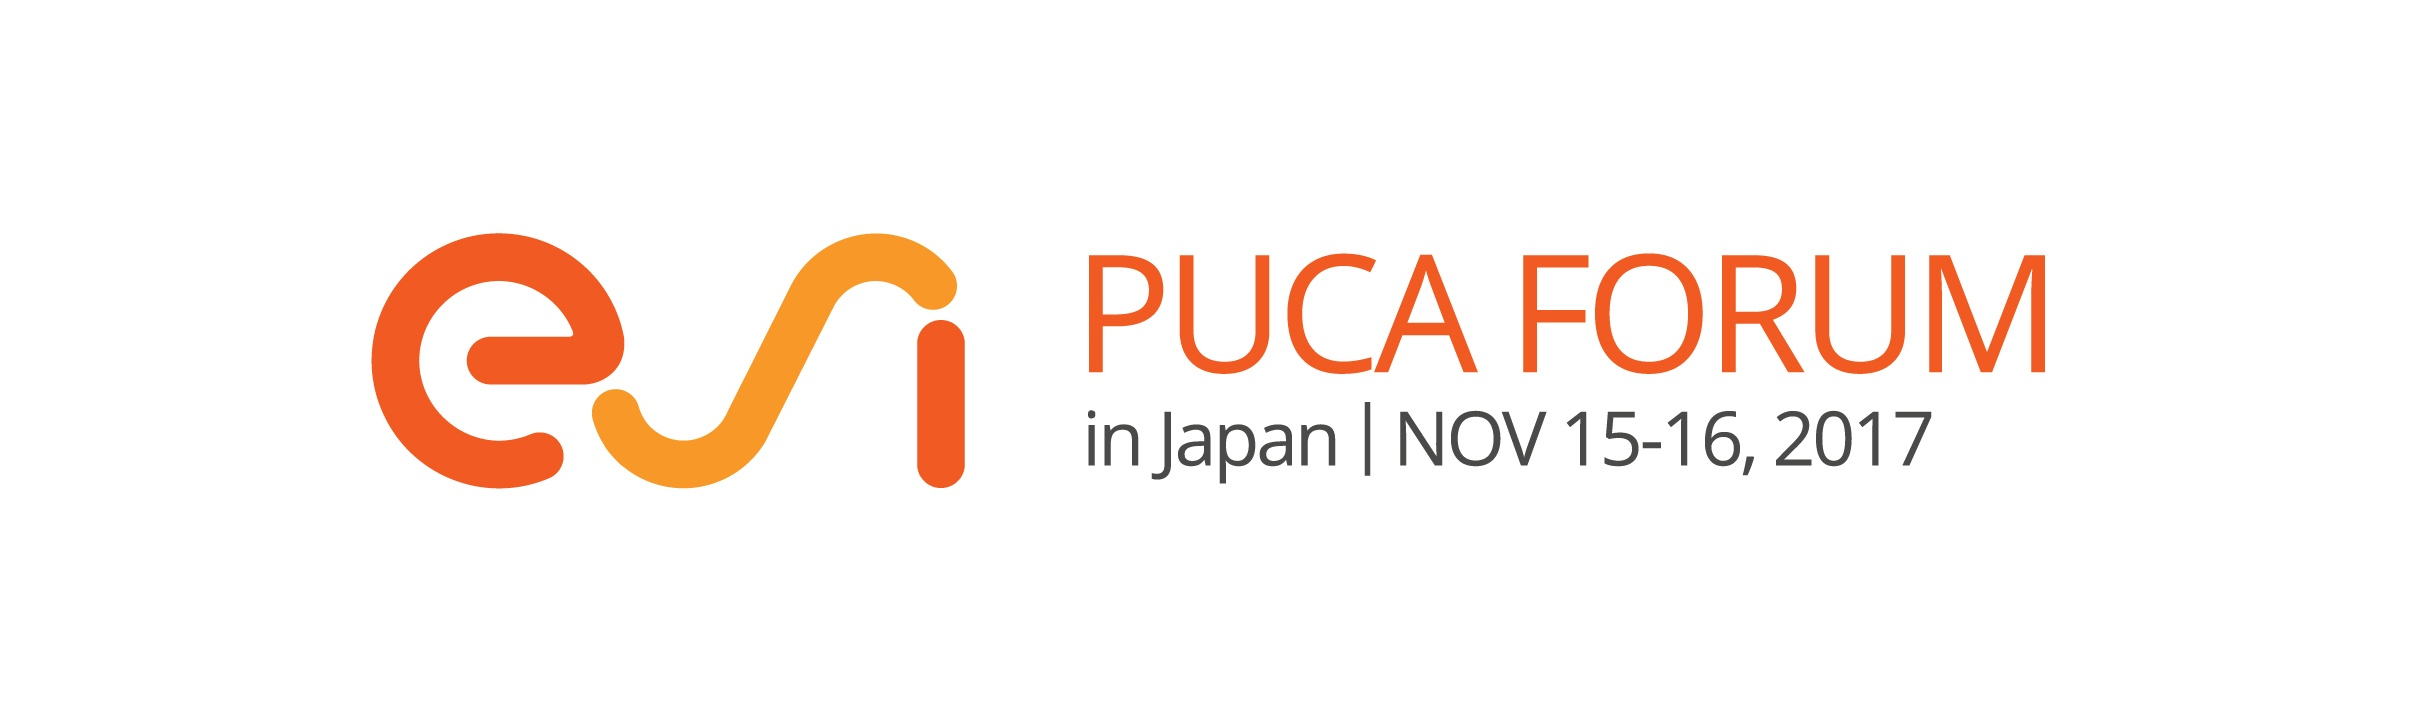 11/15(水) - 16(木) PUCA2017 開催